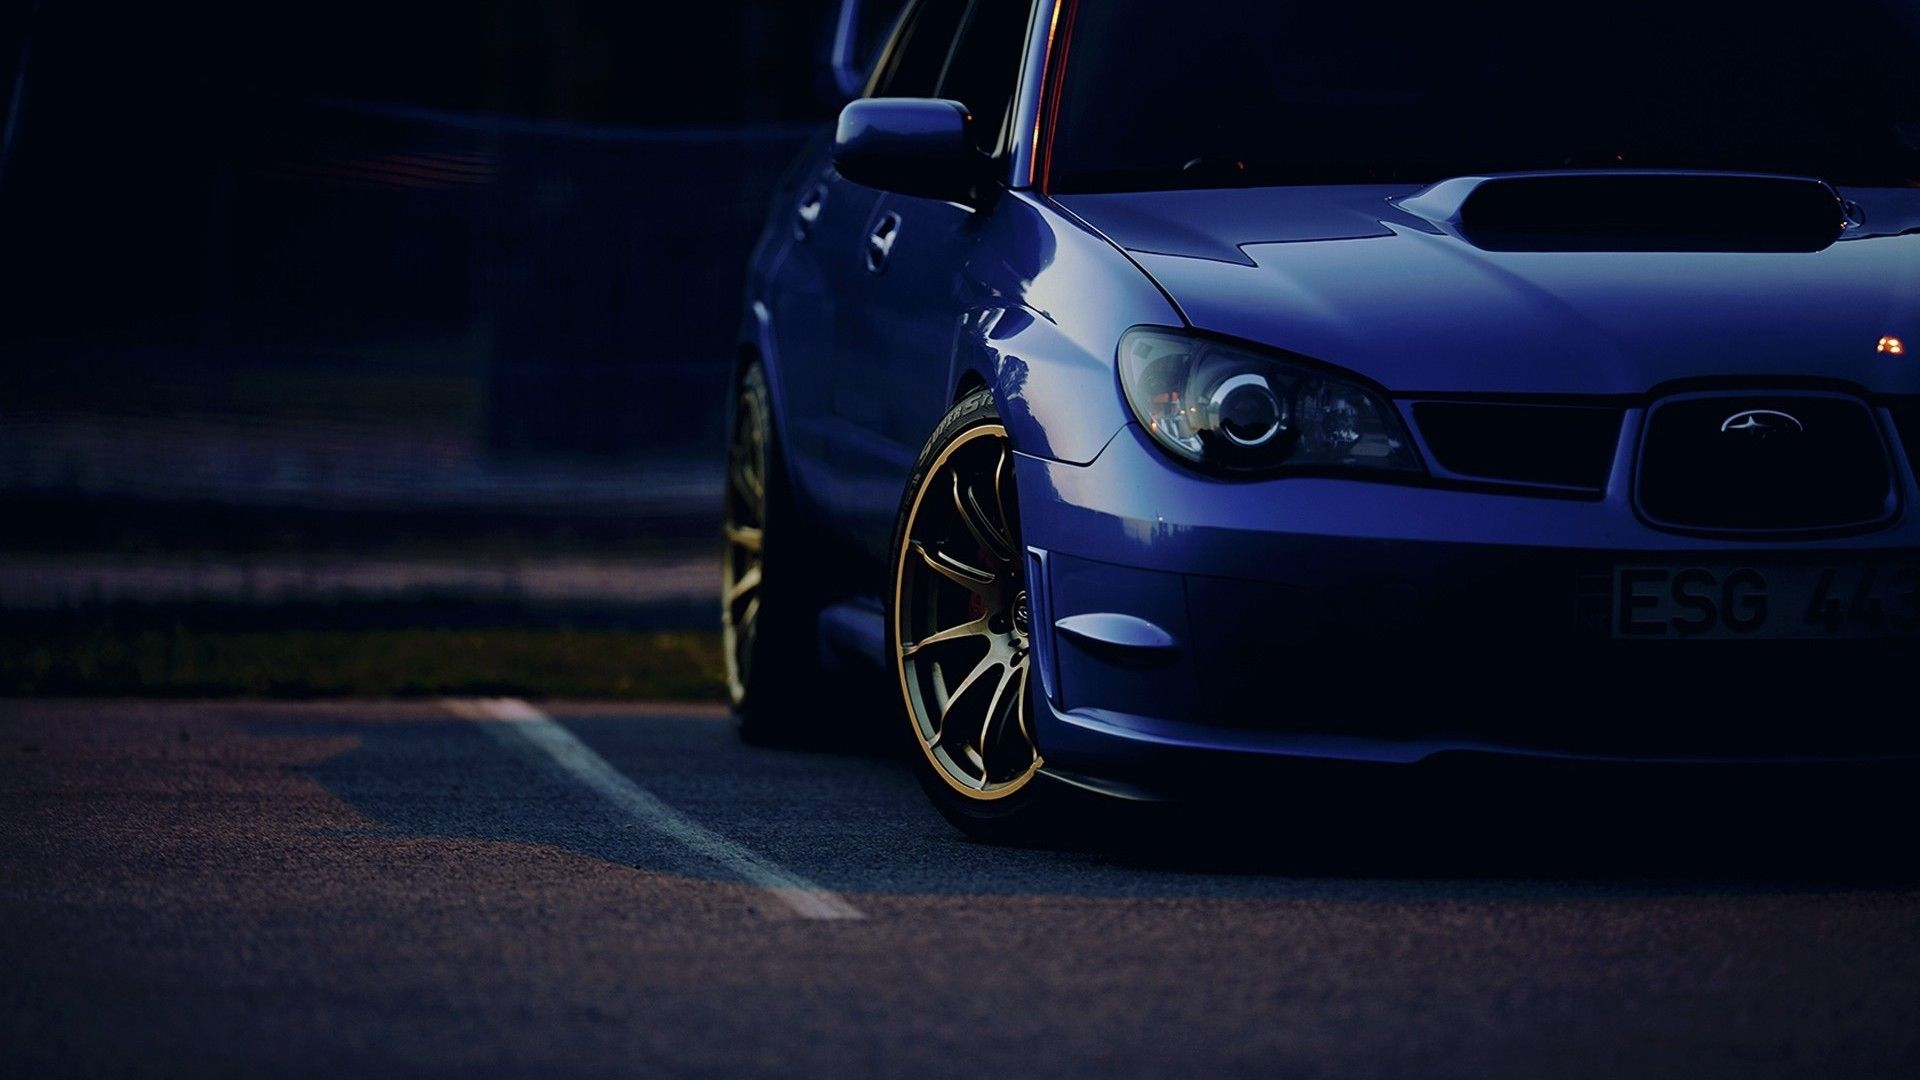 Subaru wrx jdm sti cars hd wallpaper - Subaru Impreza Wrx Sti Wallpaper Car Wallpapers My Scooby